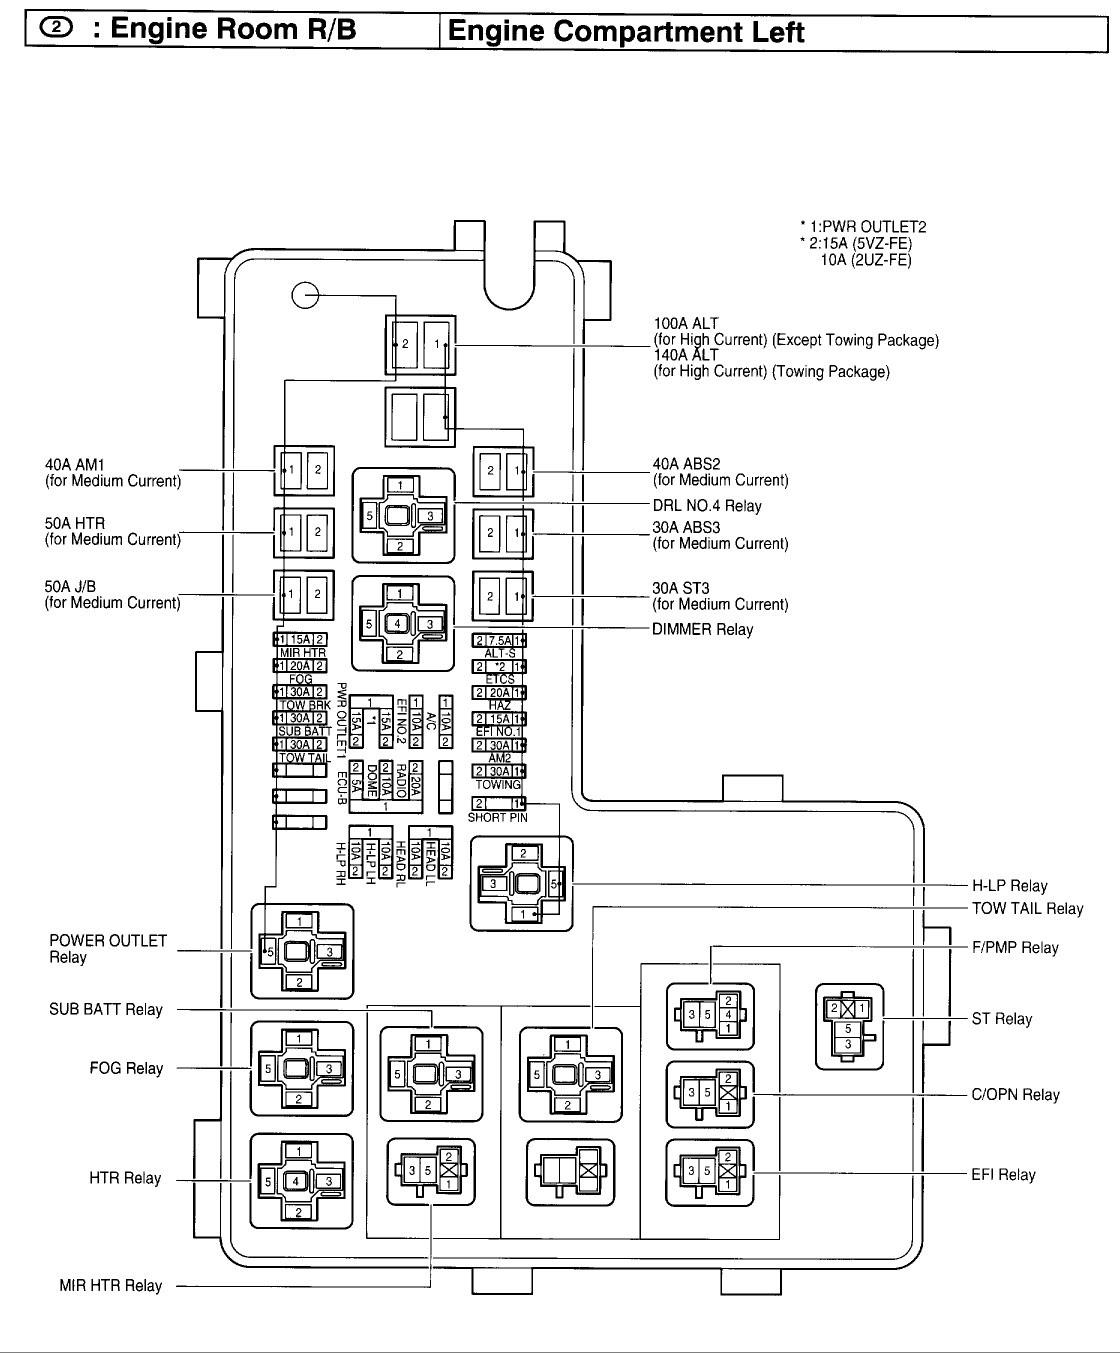 Aa4218 2001 Toyota Highlander Fuse Box Diagram Wiring Library